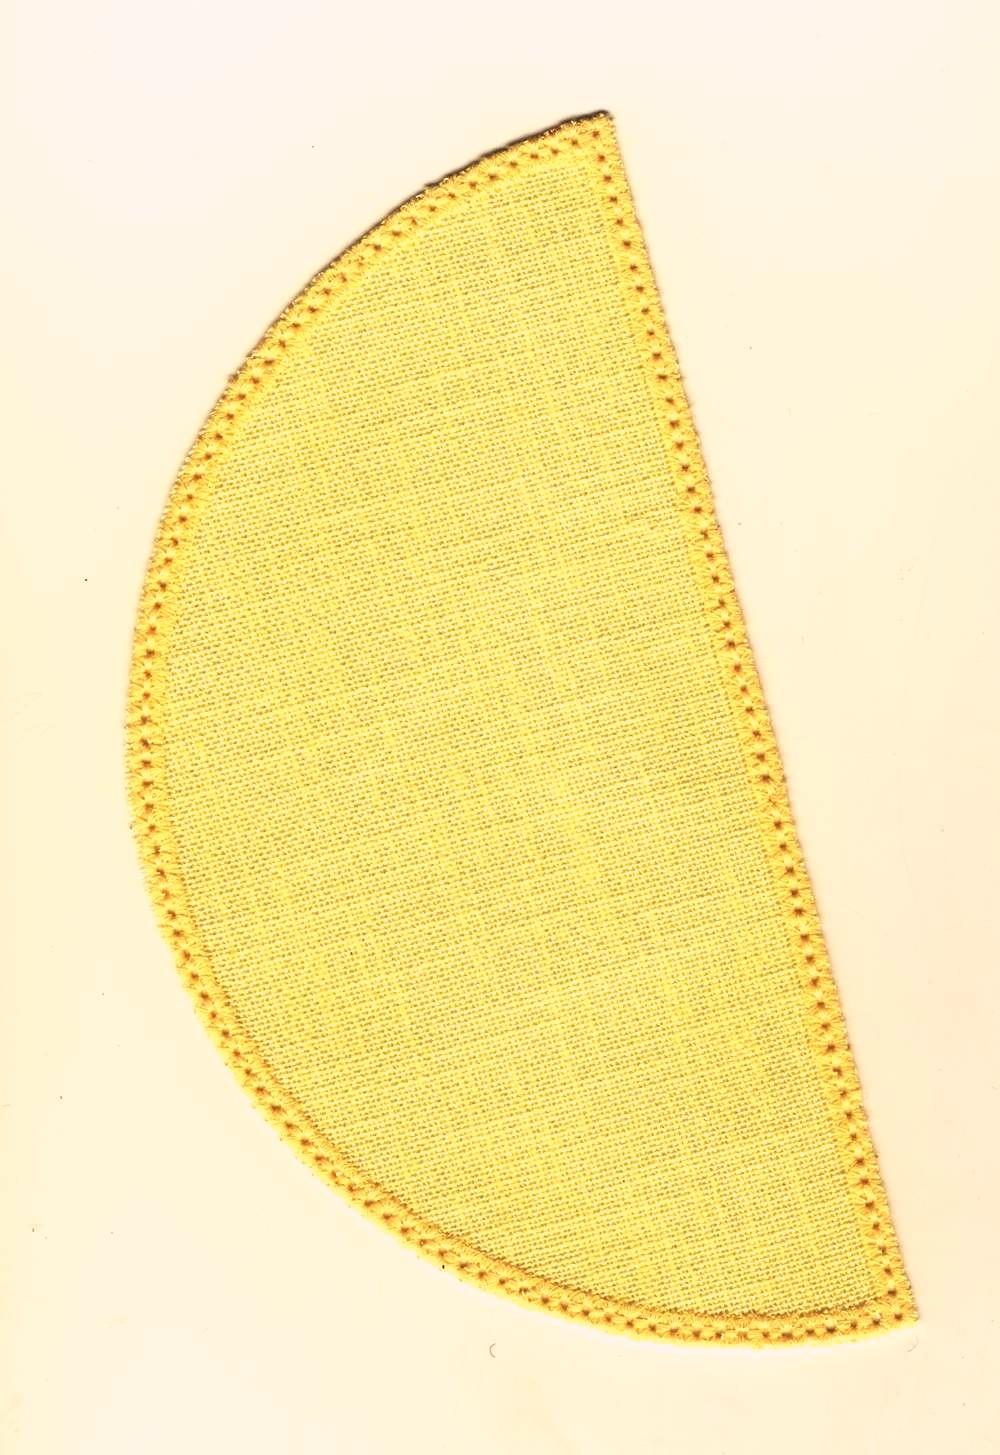 22cm Half Circle Doilies - White 22 x 11cm / 8.5 x 4.5in